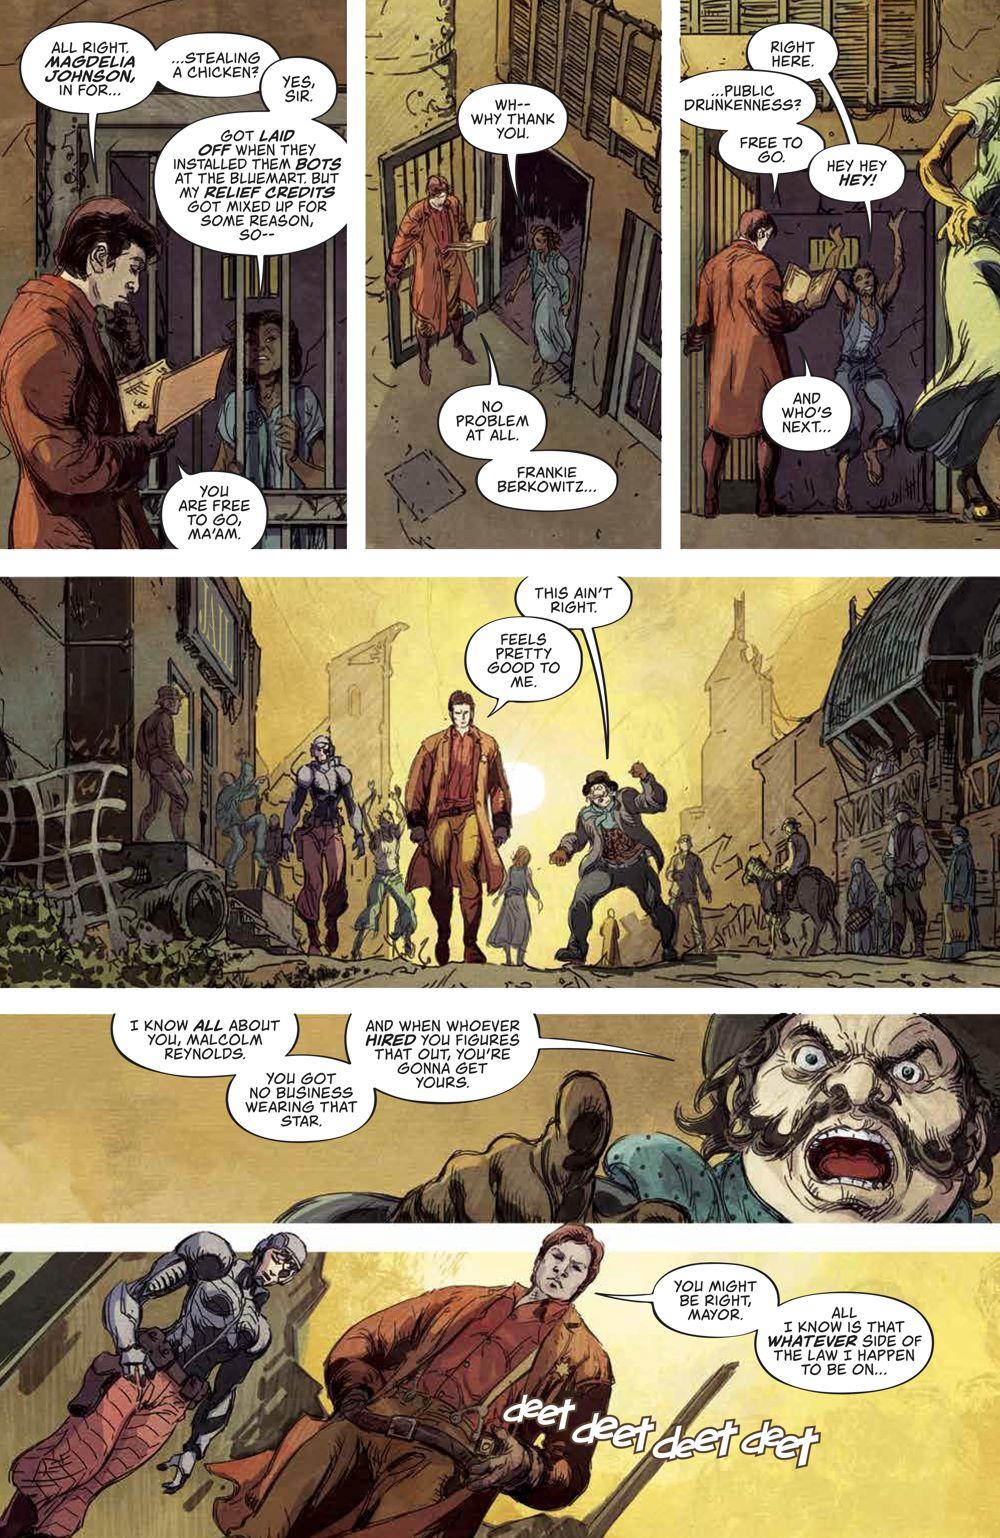 Firefly_NewSheriffVerse_v1_HC_PRESS_57 ComicList Previews: FIREFLY NEW SHERIFF IN THE 'VERSE VOLUME 1 HC